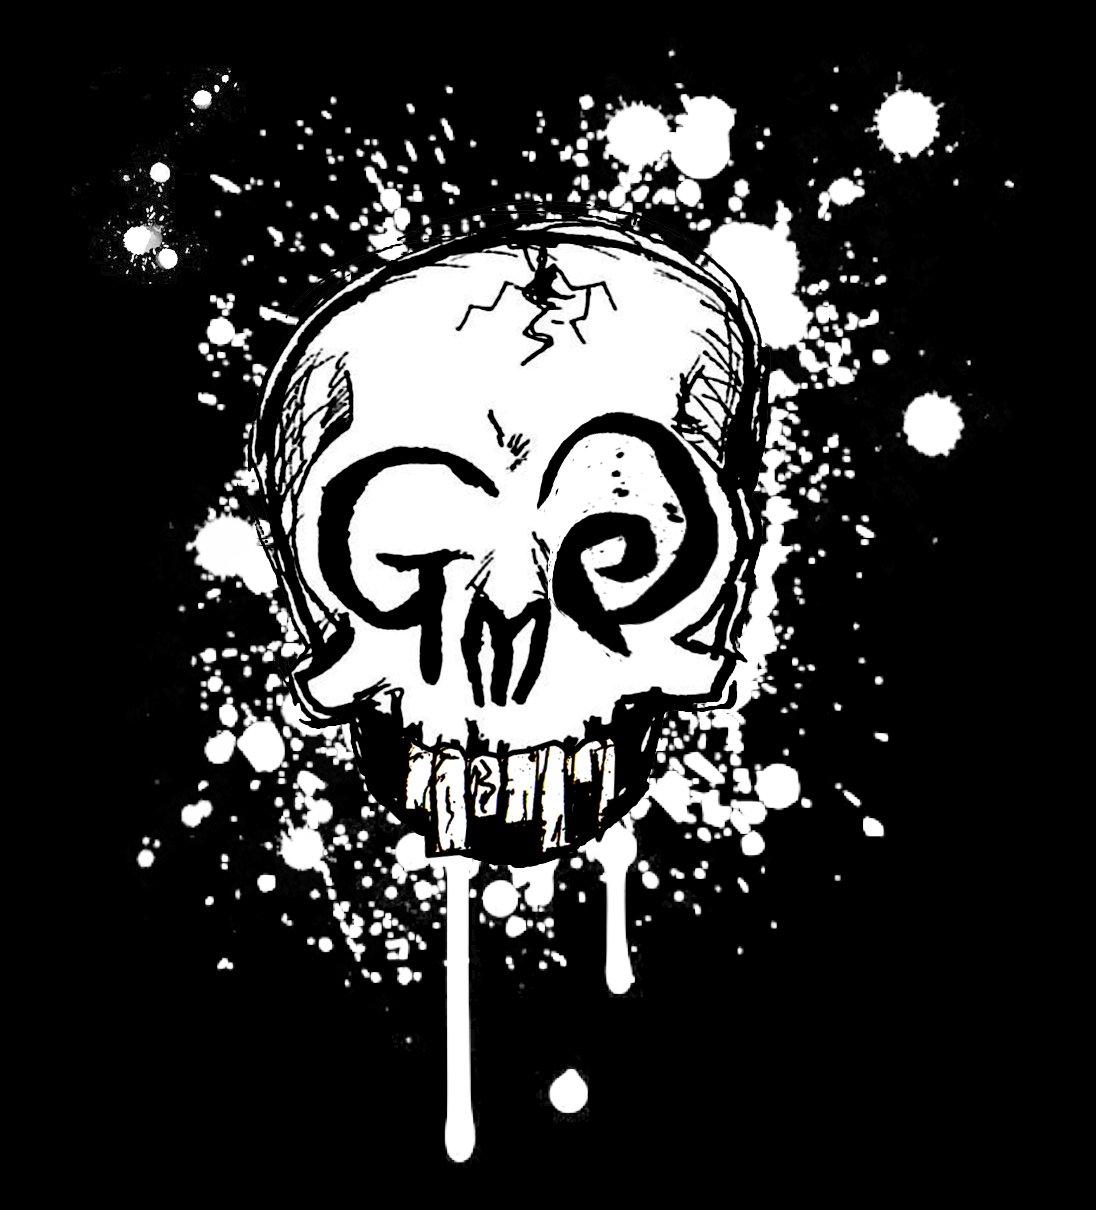 Grantgoodwine